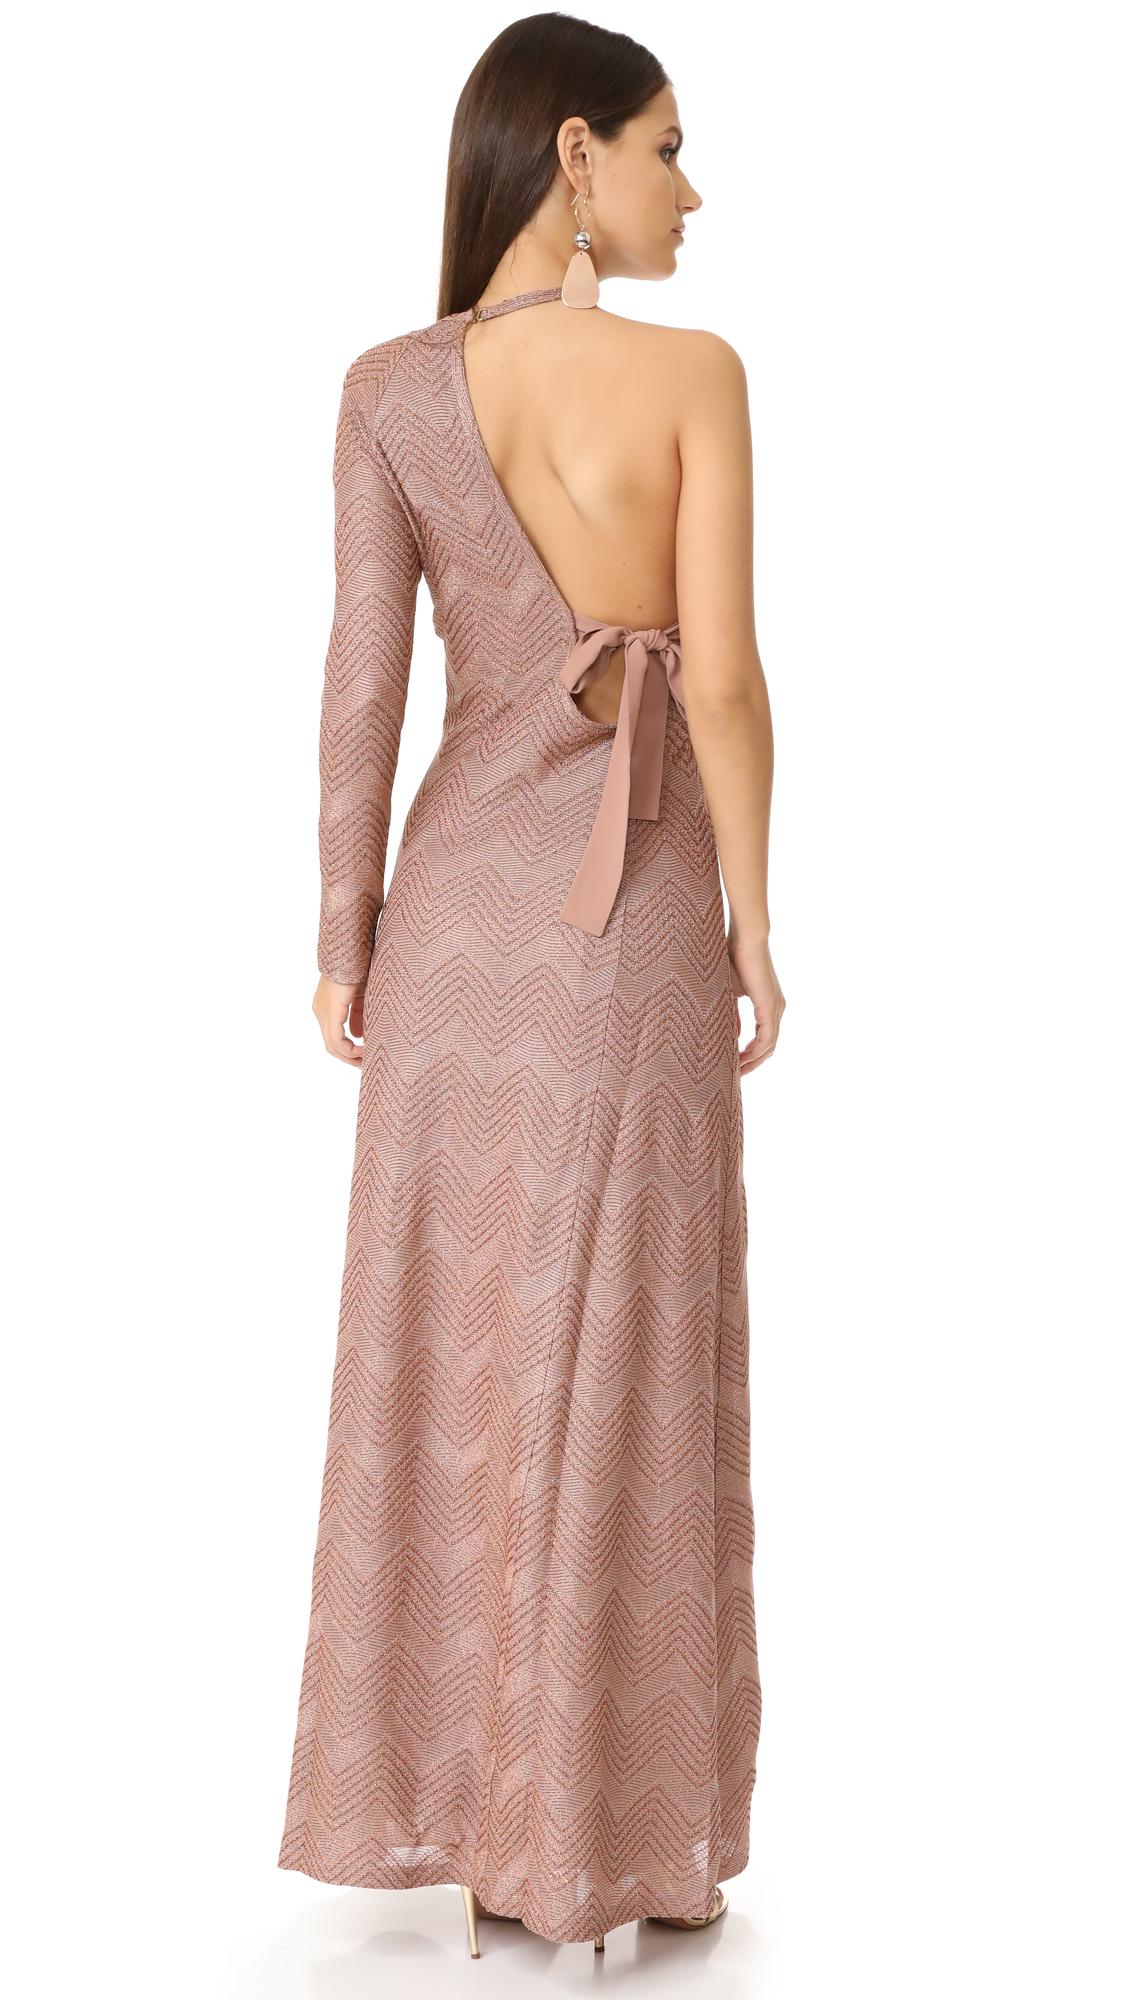 M Missoni Lurex One Shoulder Maxi Dress | SHOPBOP